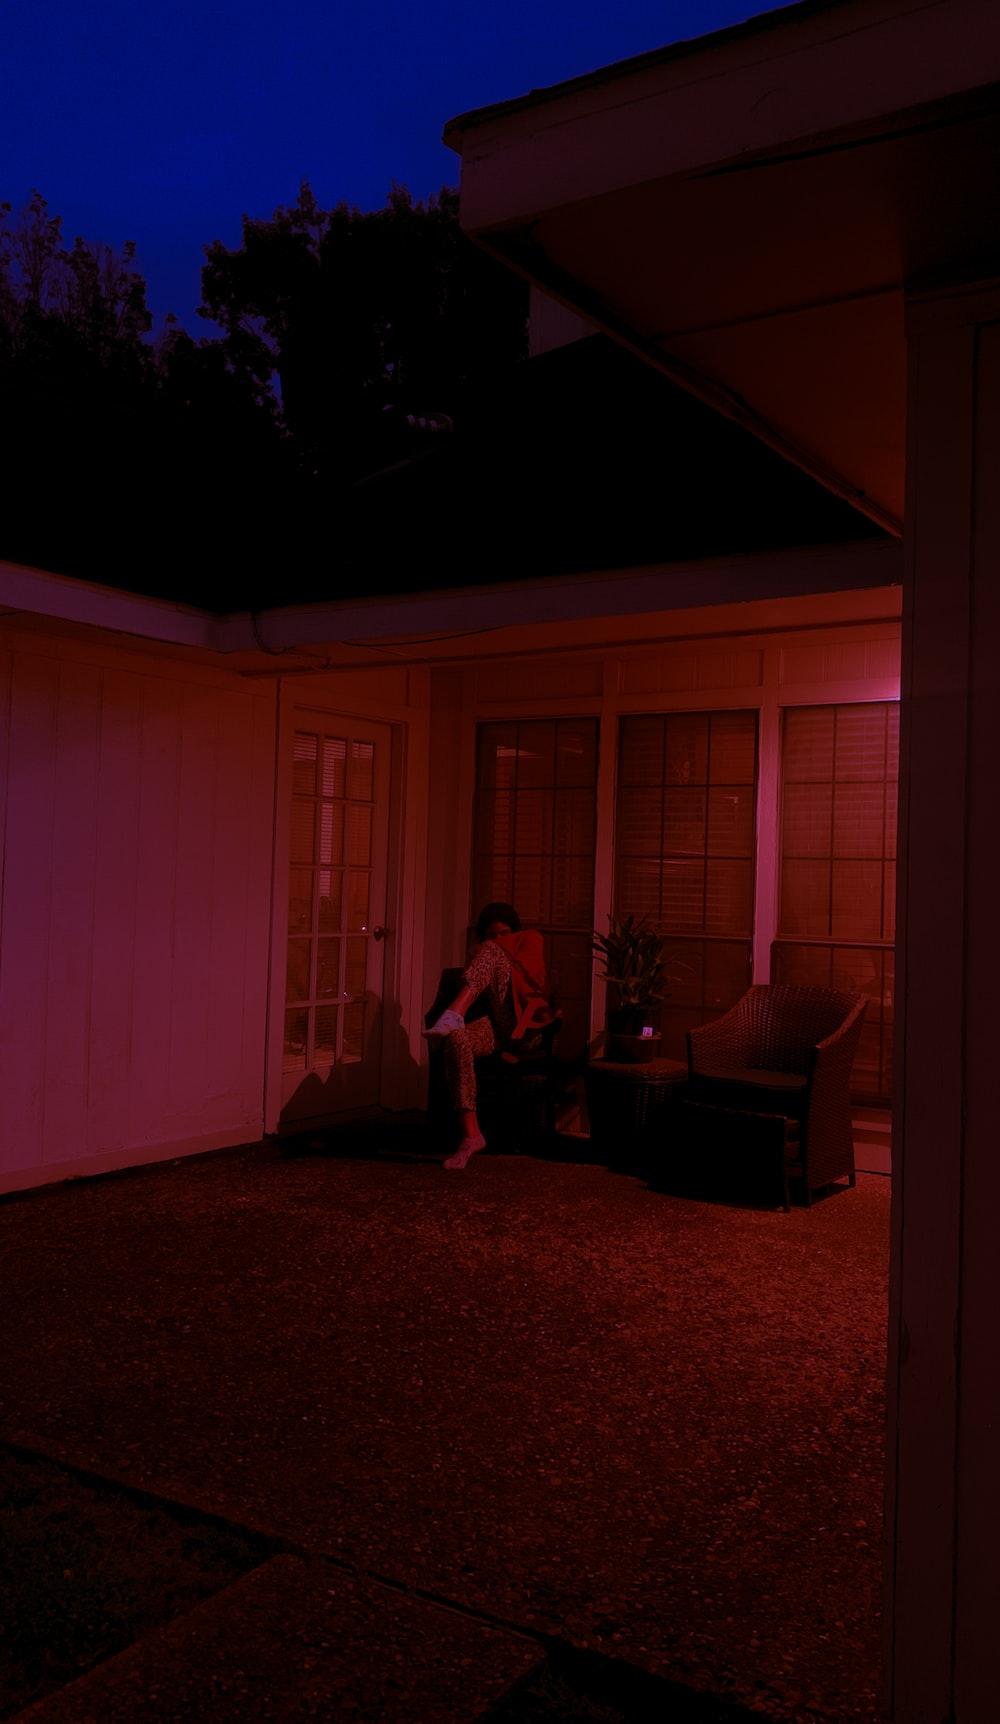 woman in pink dress standing near white wooden door